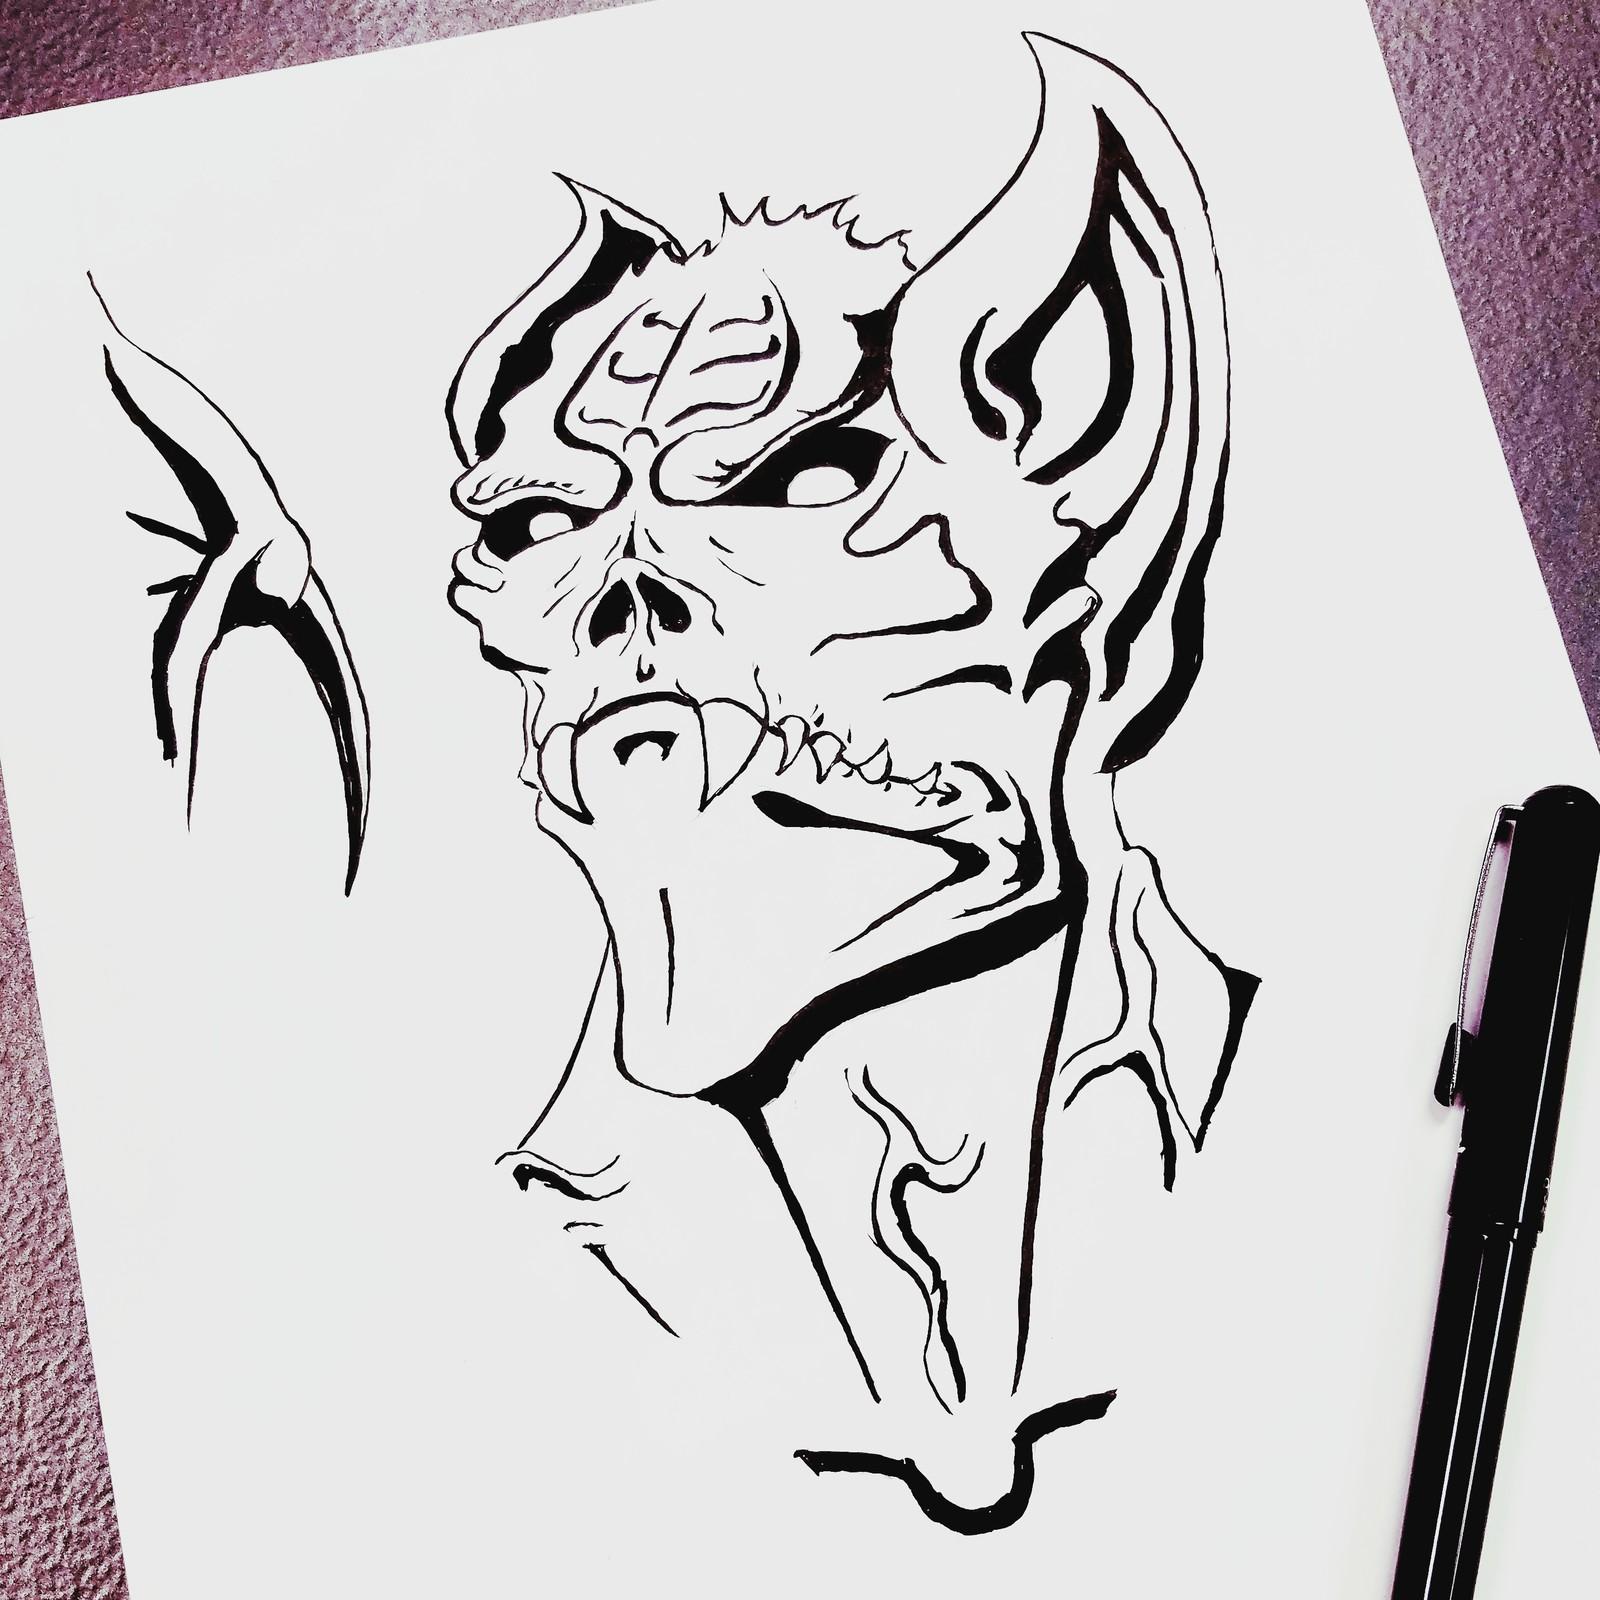 Man-Bat (Inktober Day 9: Screech)